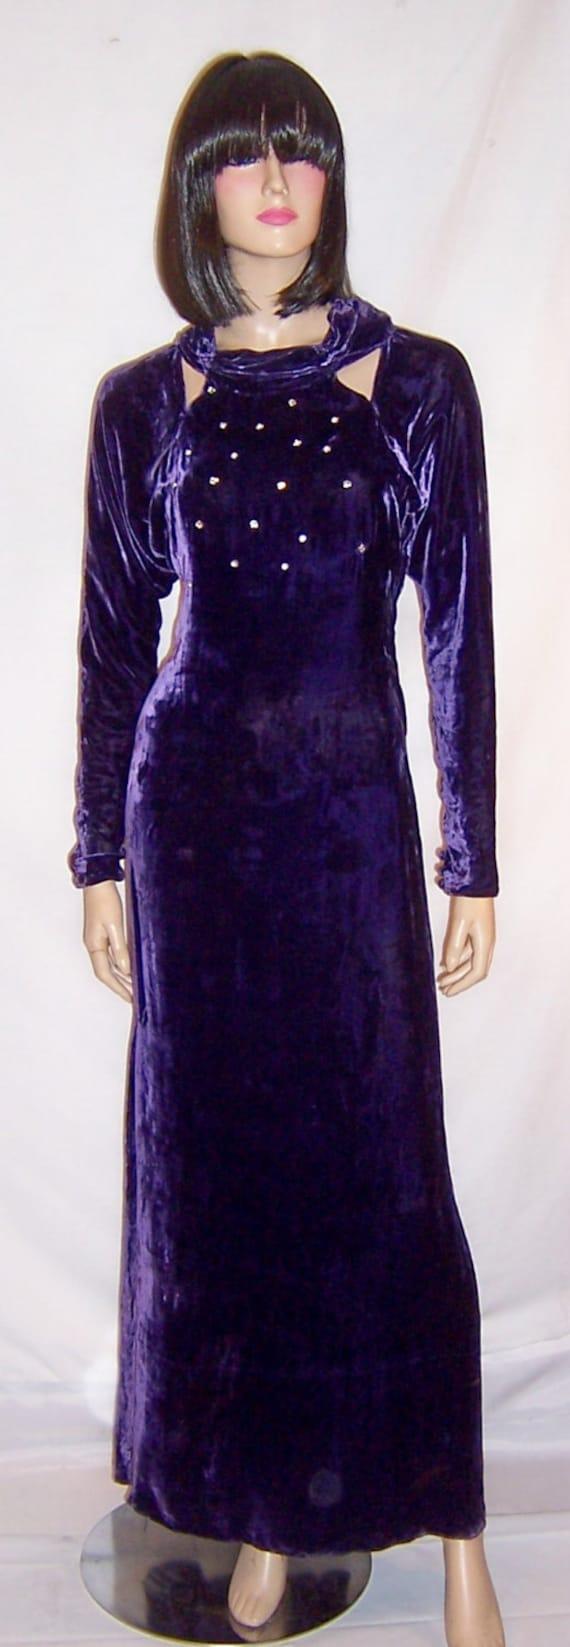 1930's Violet Silk Velvet Evening Gown with Rhines